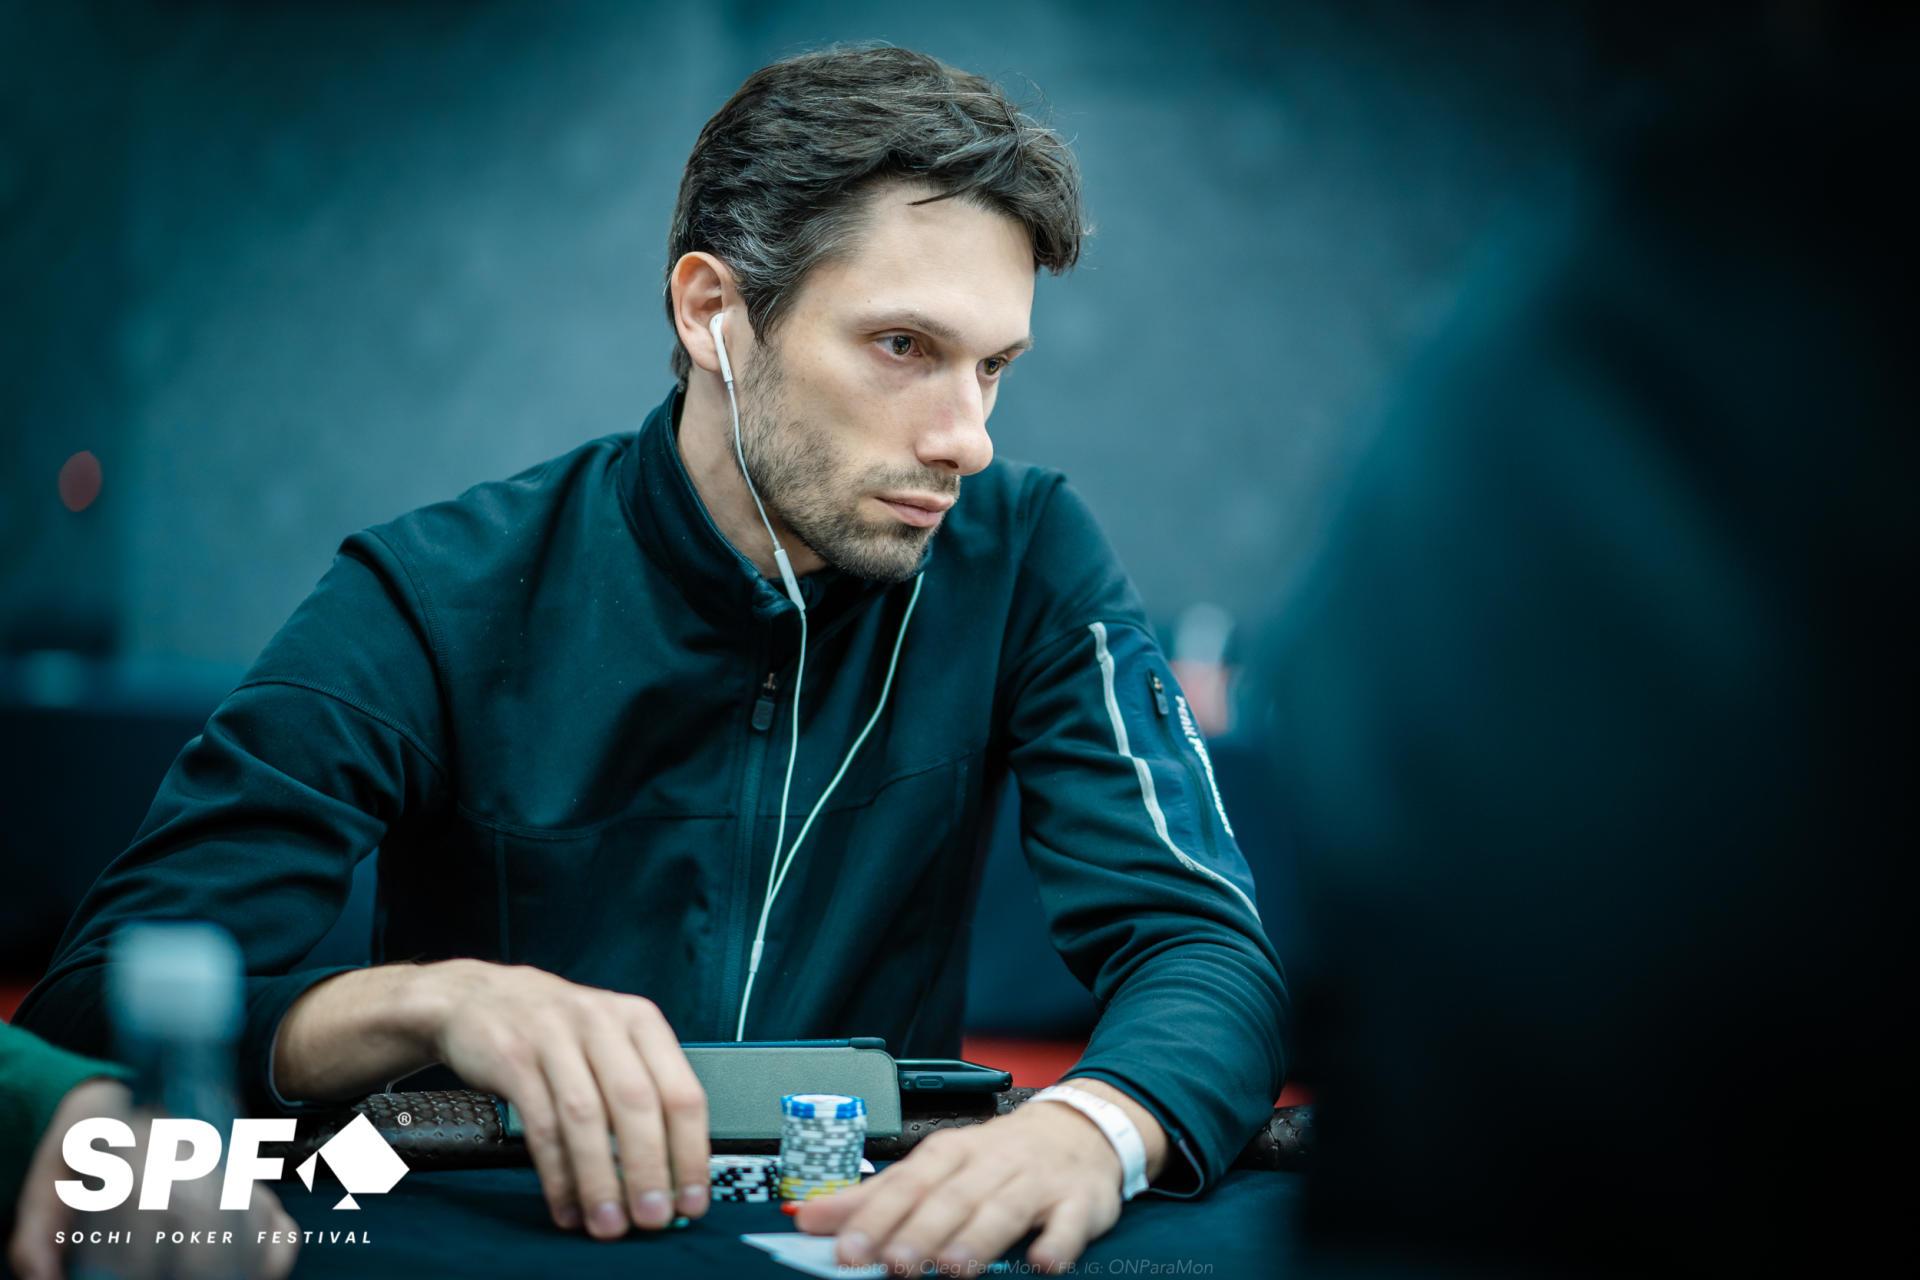 Dmitrii Zharkikh